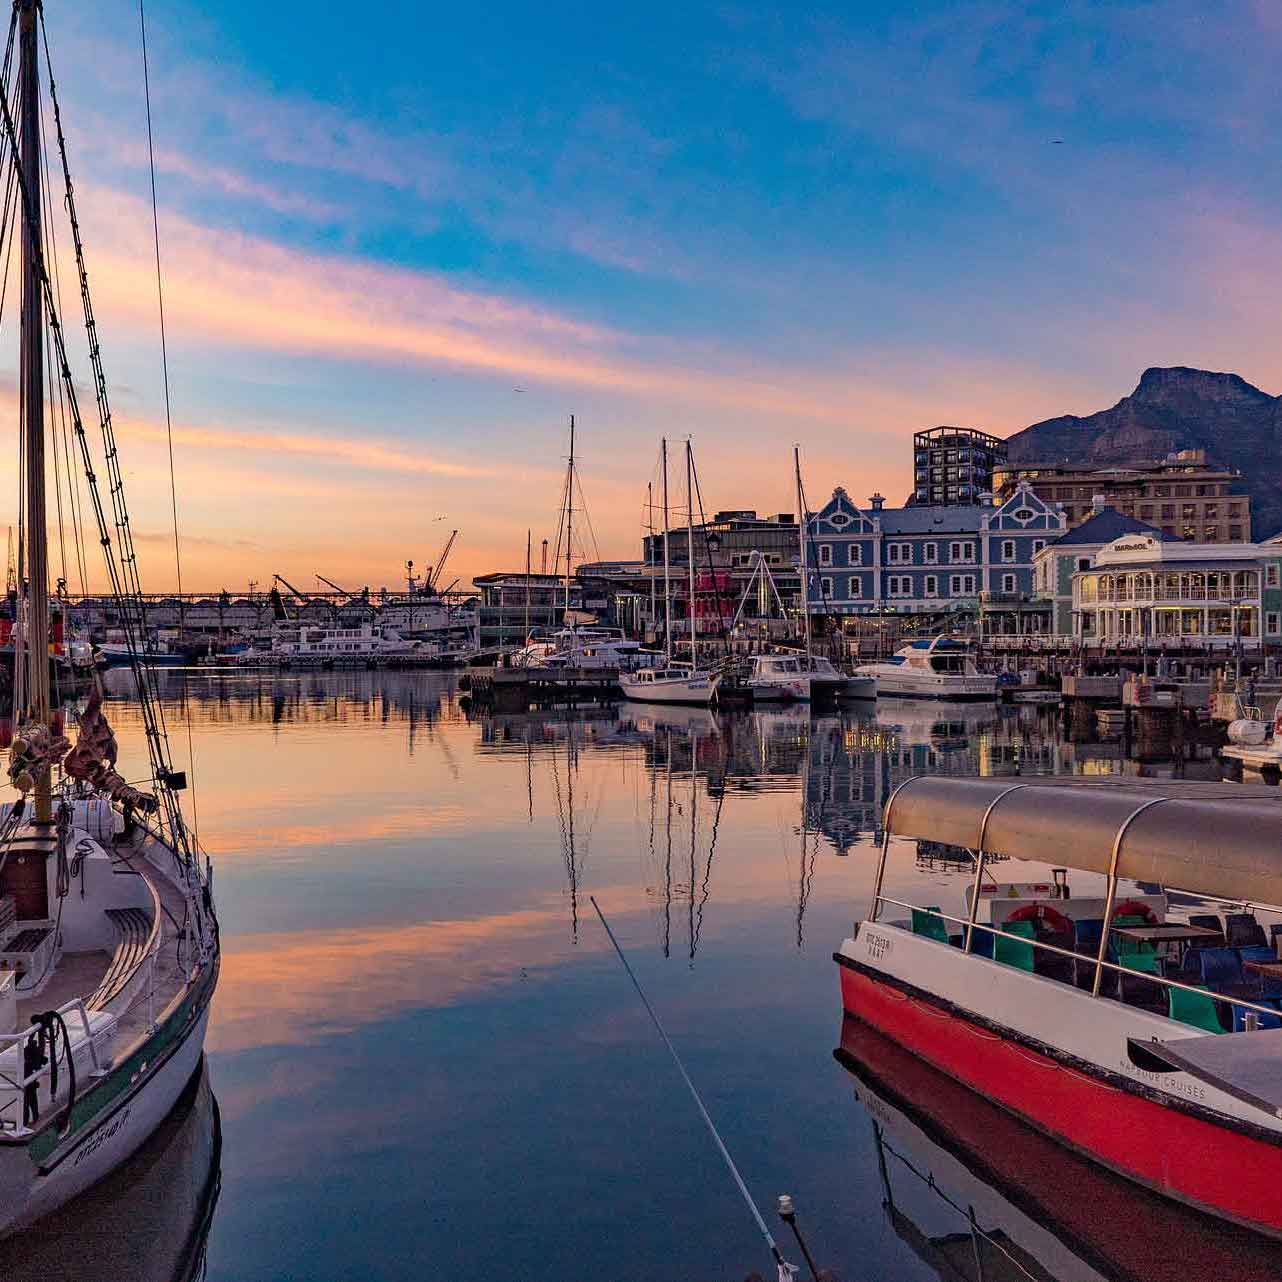 Dating-Ort Südafrica gauteng